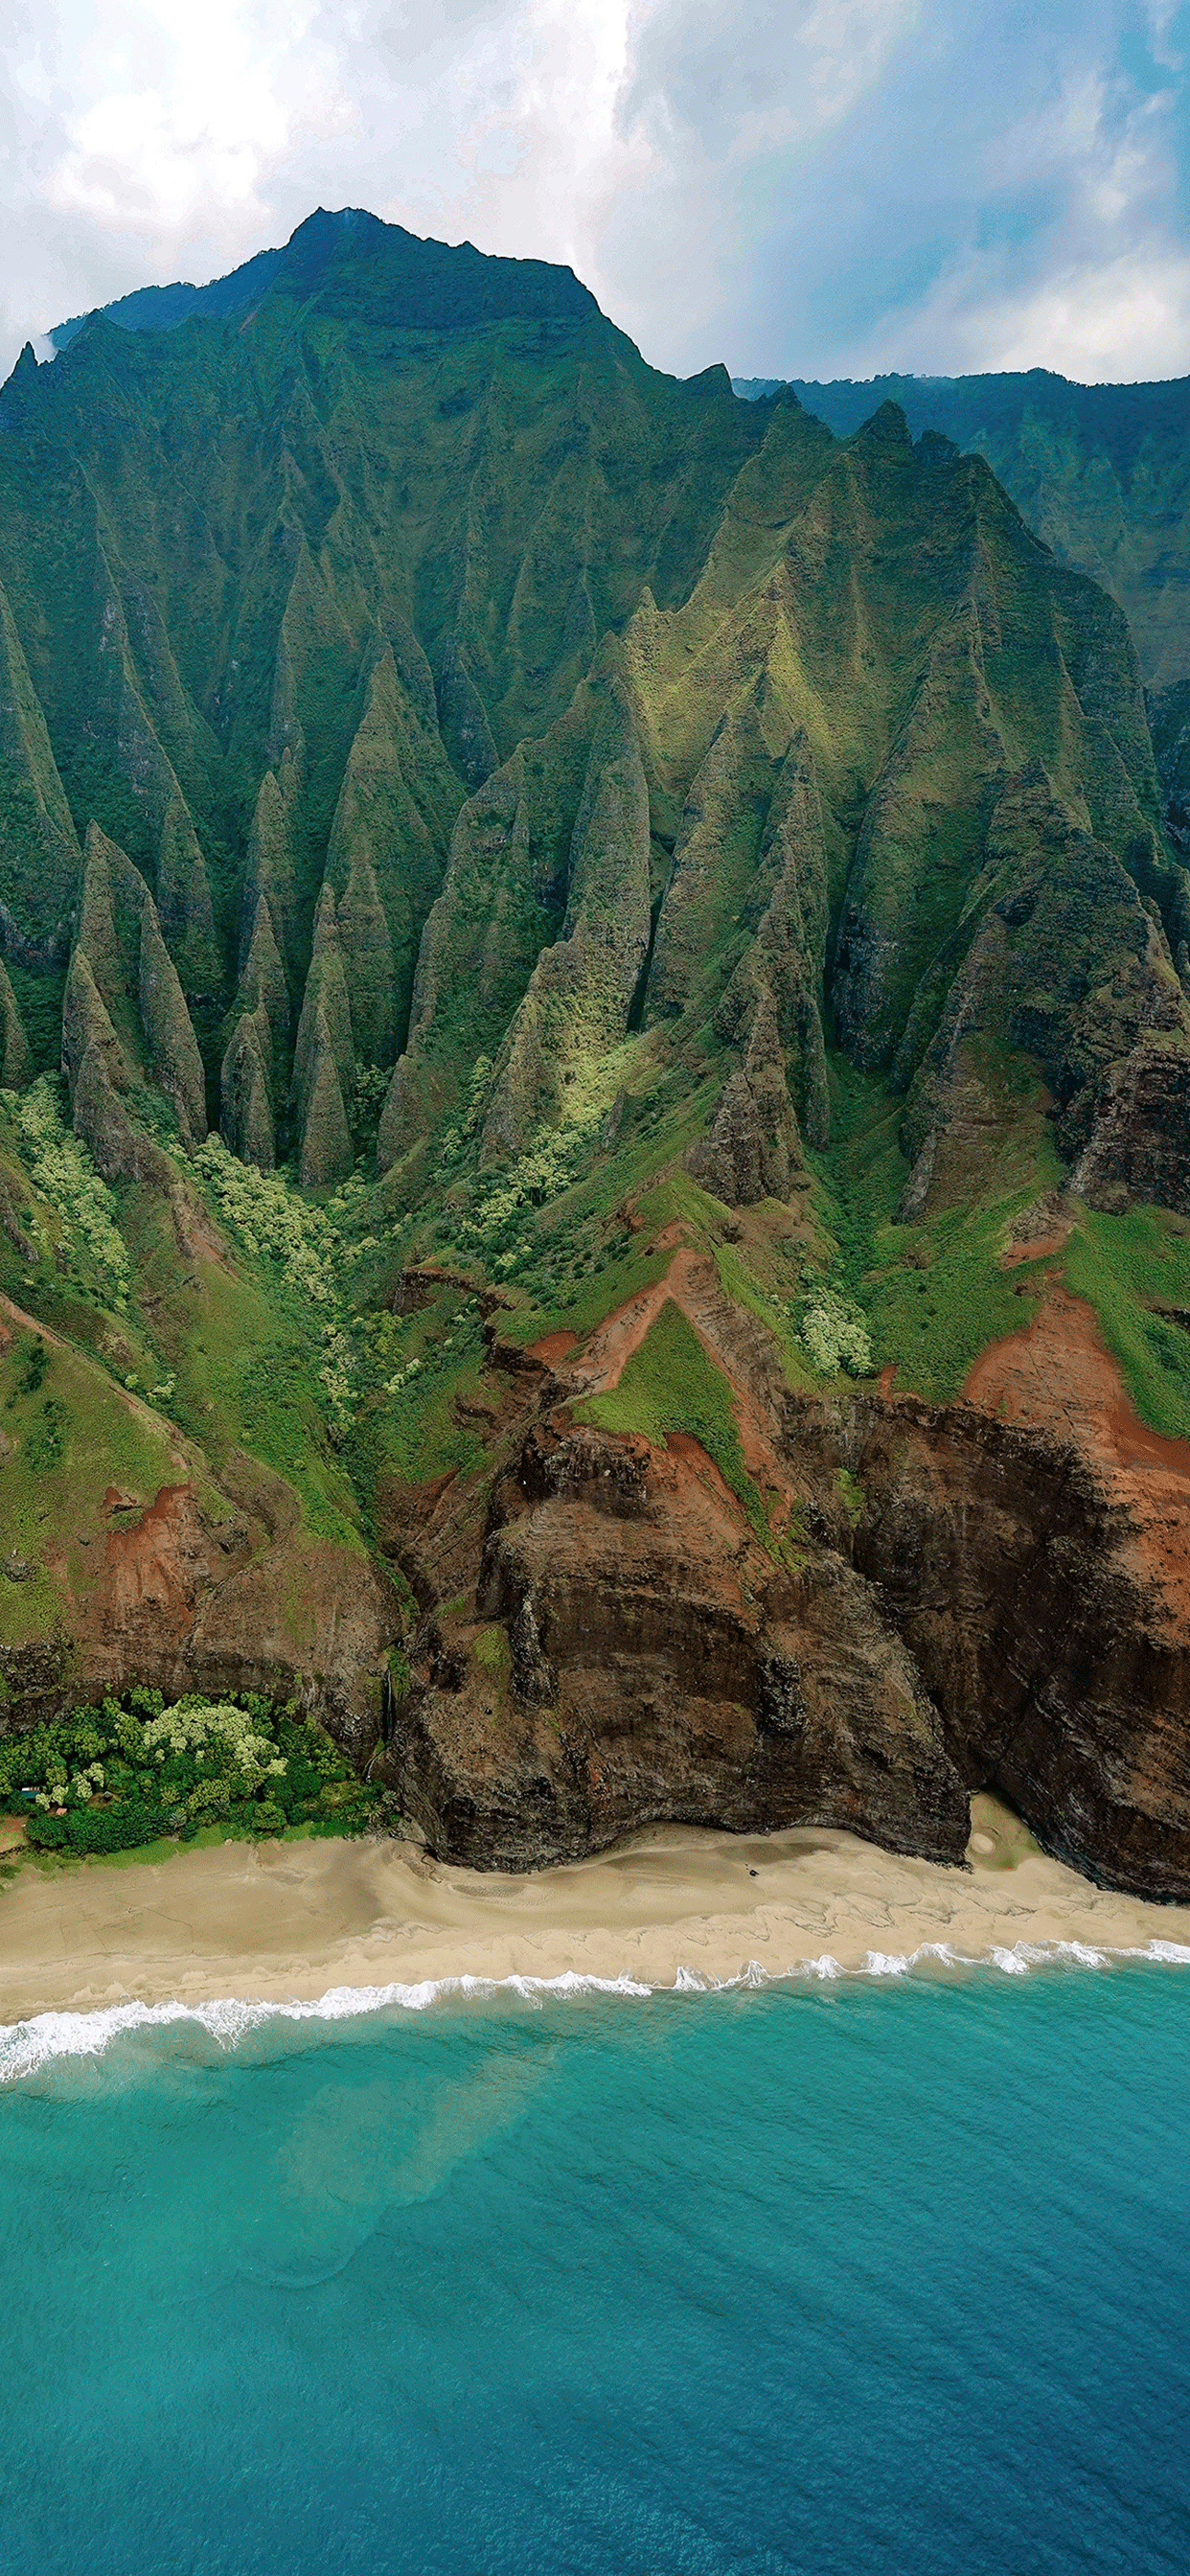 iPhone wallpaper Na%CC%84 Pali Coast mountains Fonds d'écran iPhone du 29/03/2019